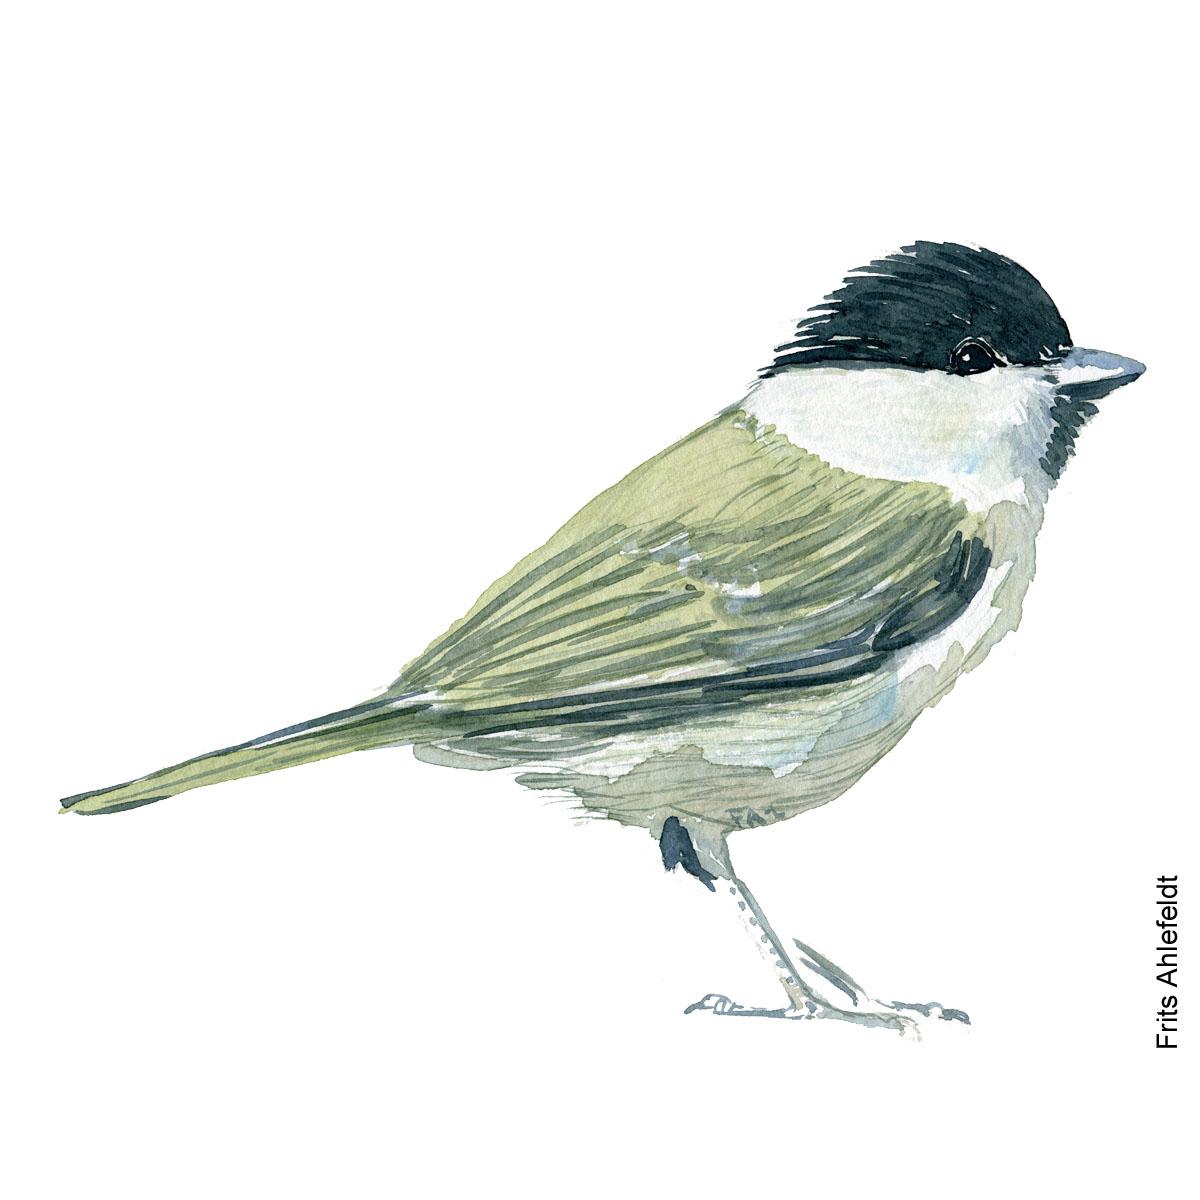 Sumpmejse - Marsh tit bird watercolor painting. Artwork by Frits Ahlefeldt. Fugle akvarel